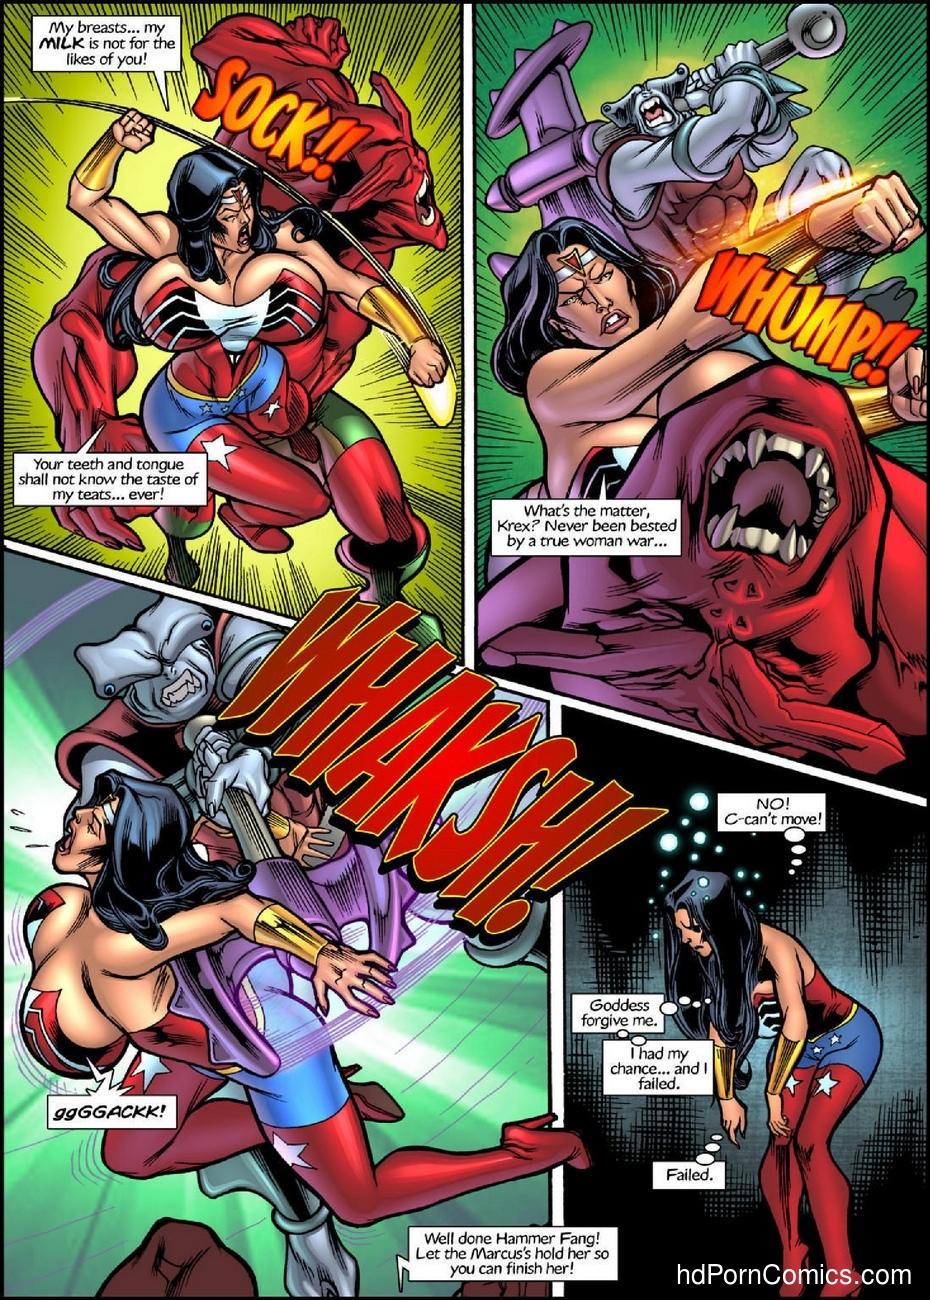 Freedom Stars - Cattle Call 1 22 free sex comic